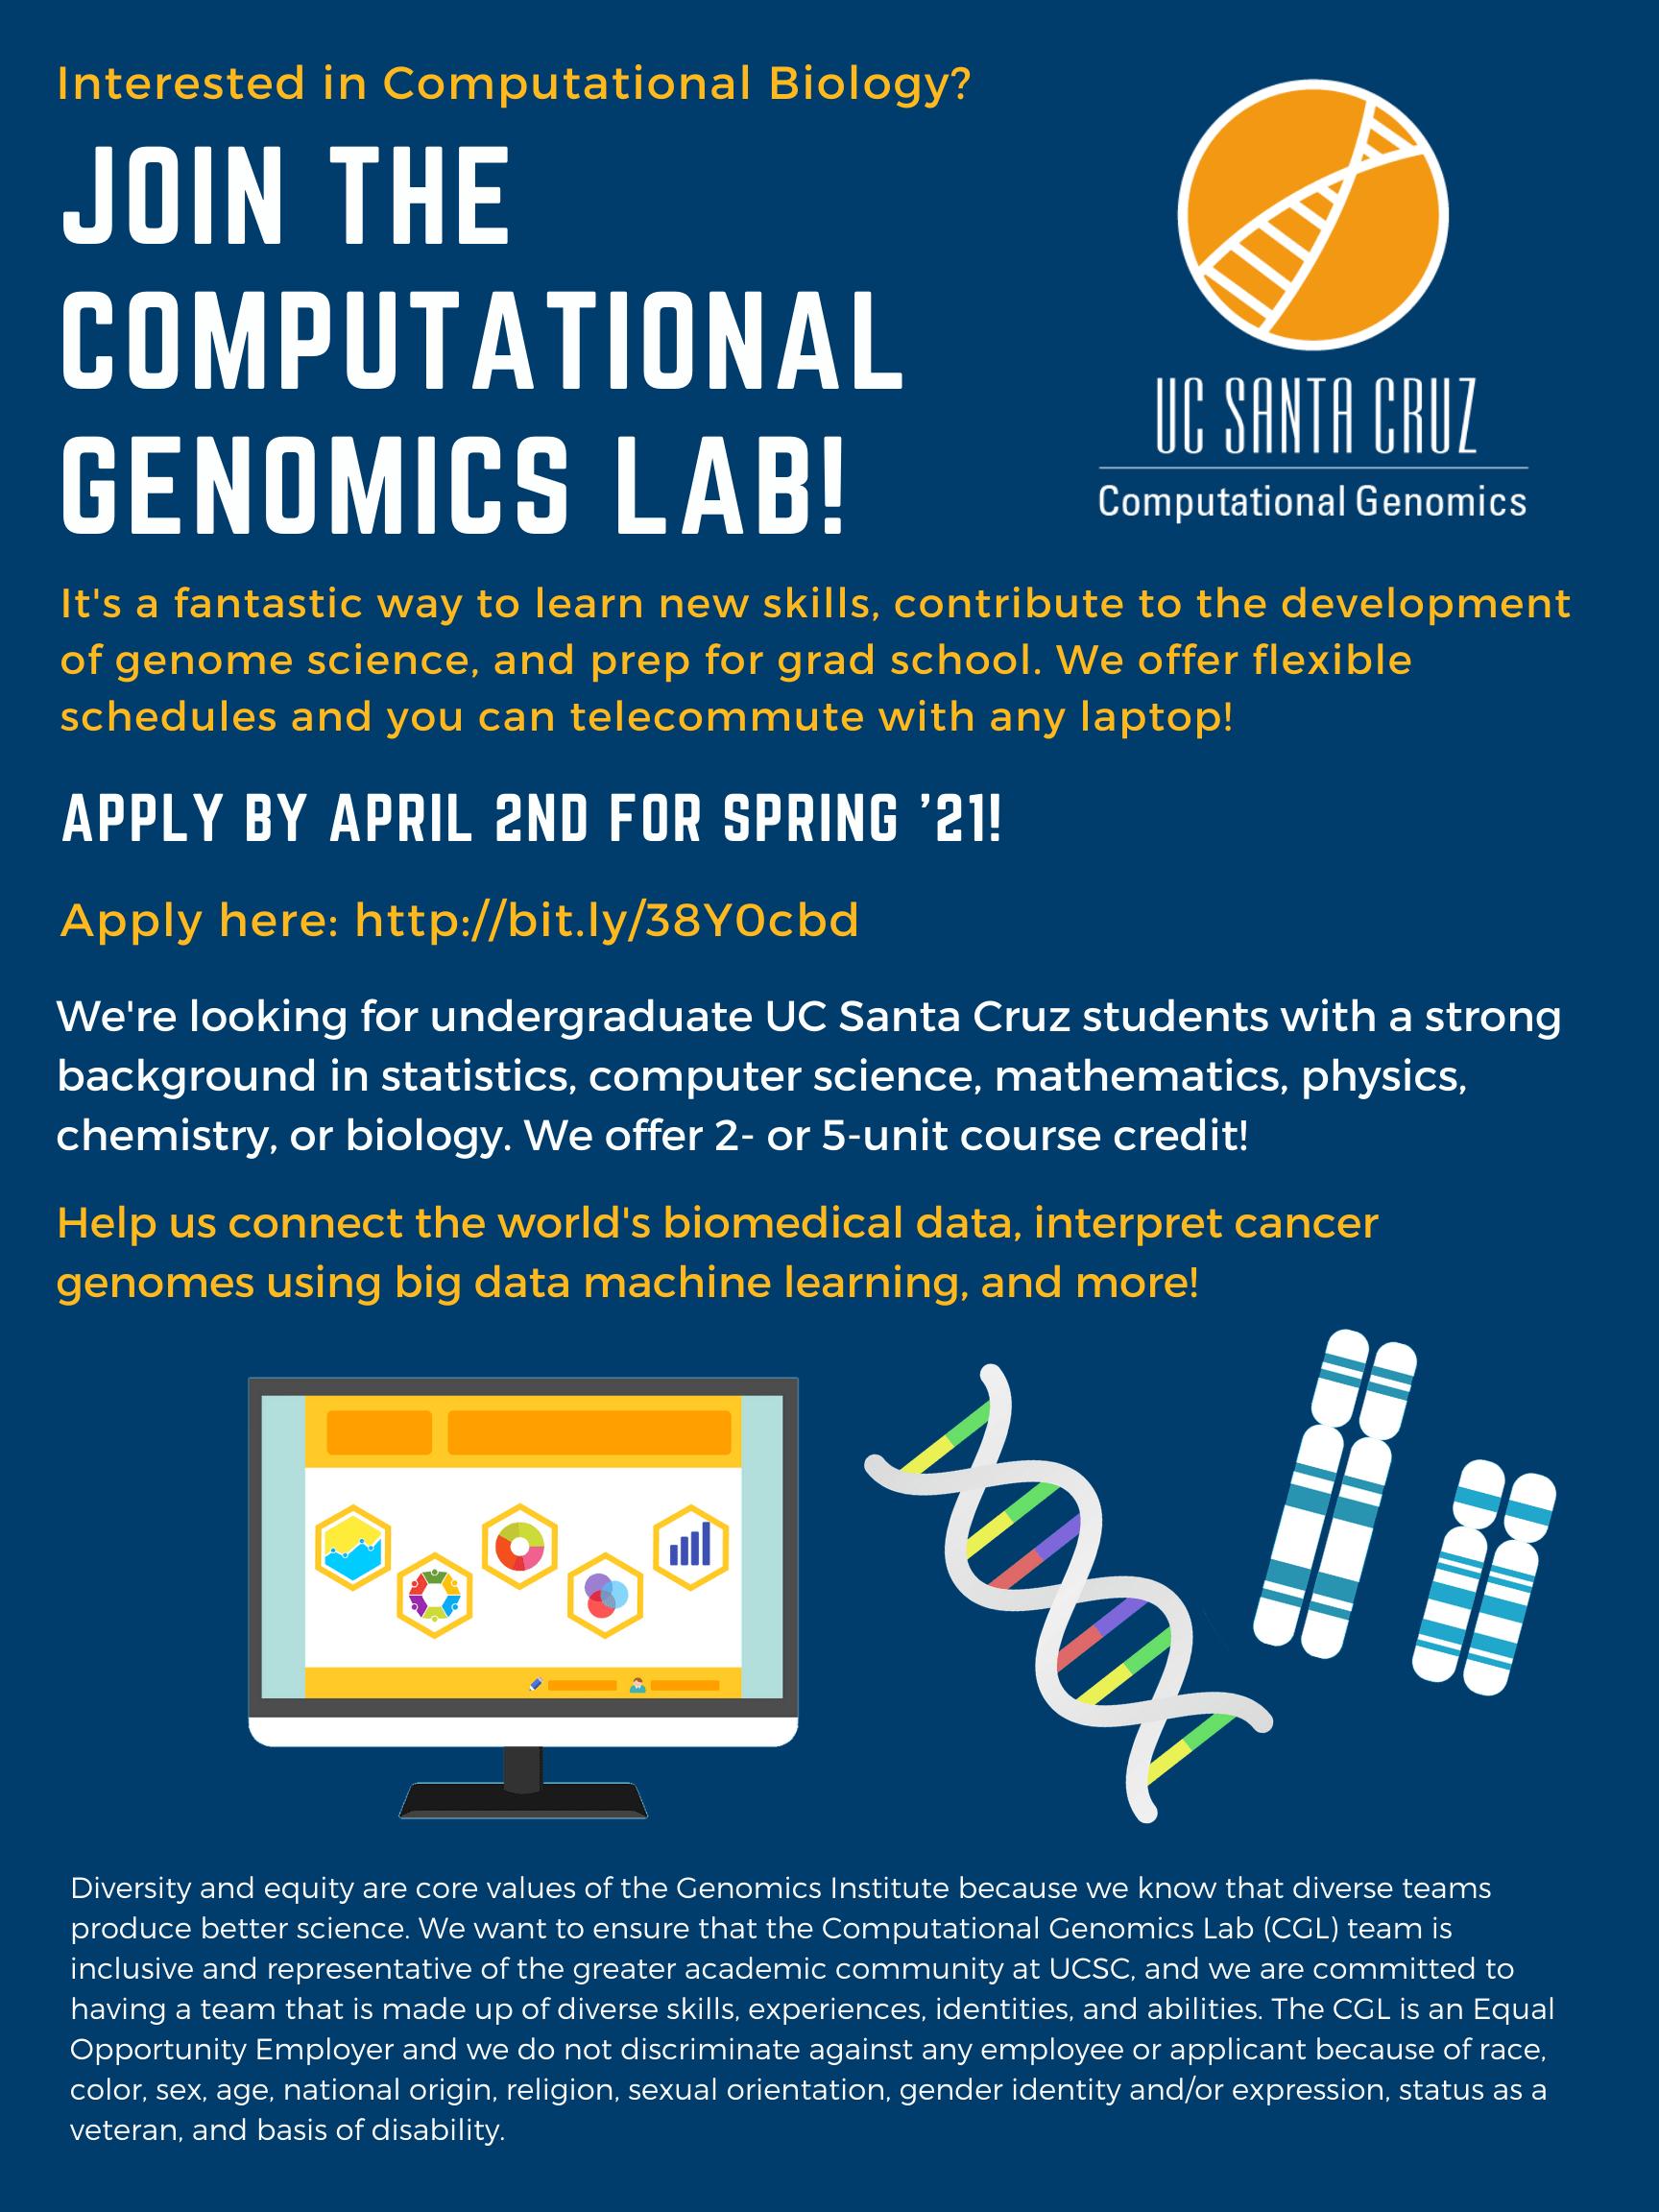 Opportunities | Computational Genomics Laboratory (CGL)